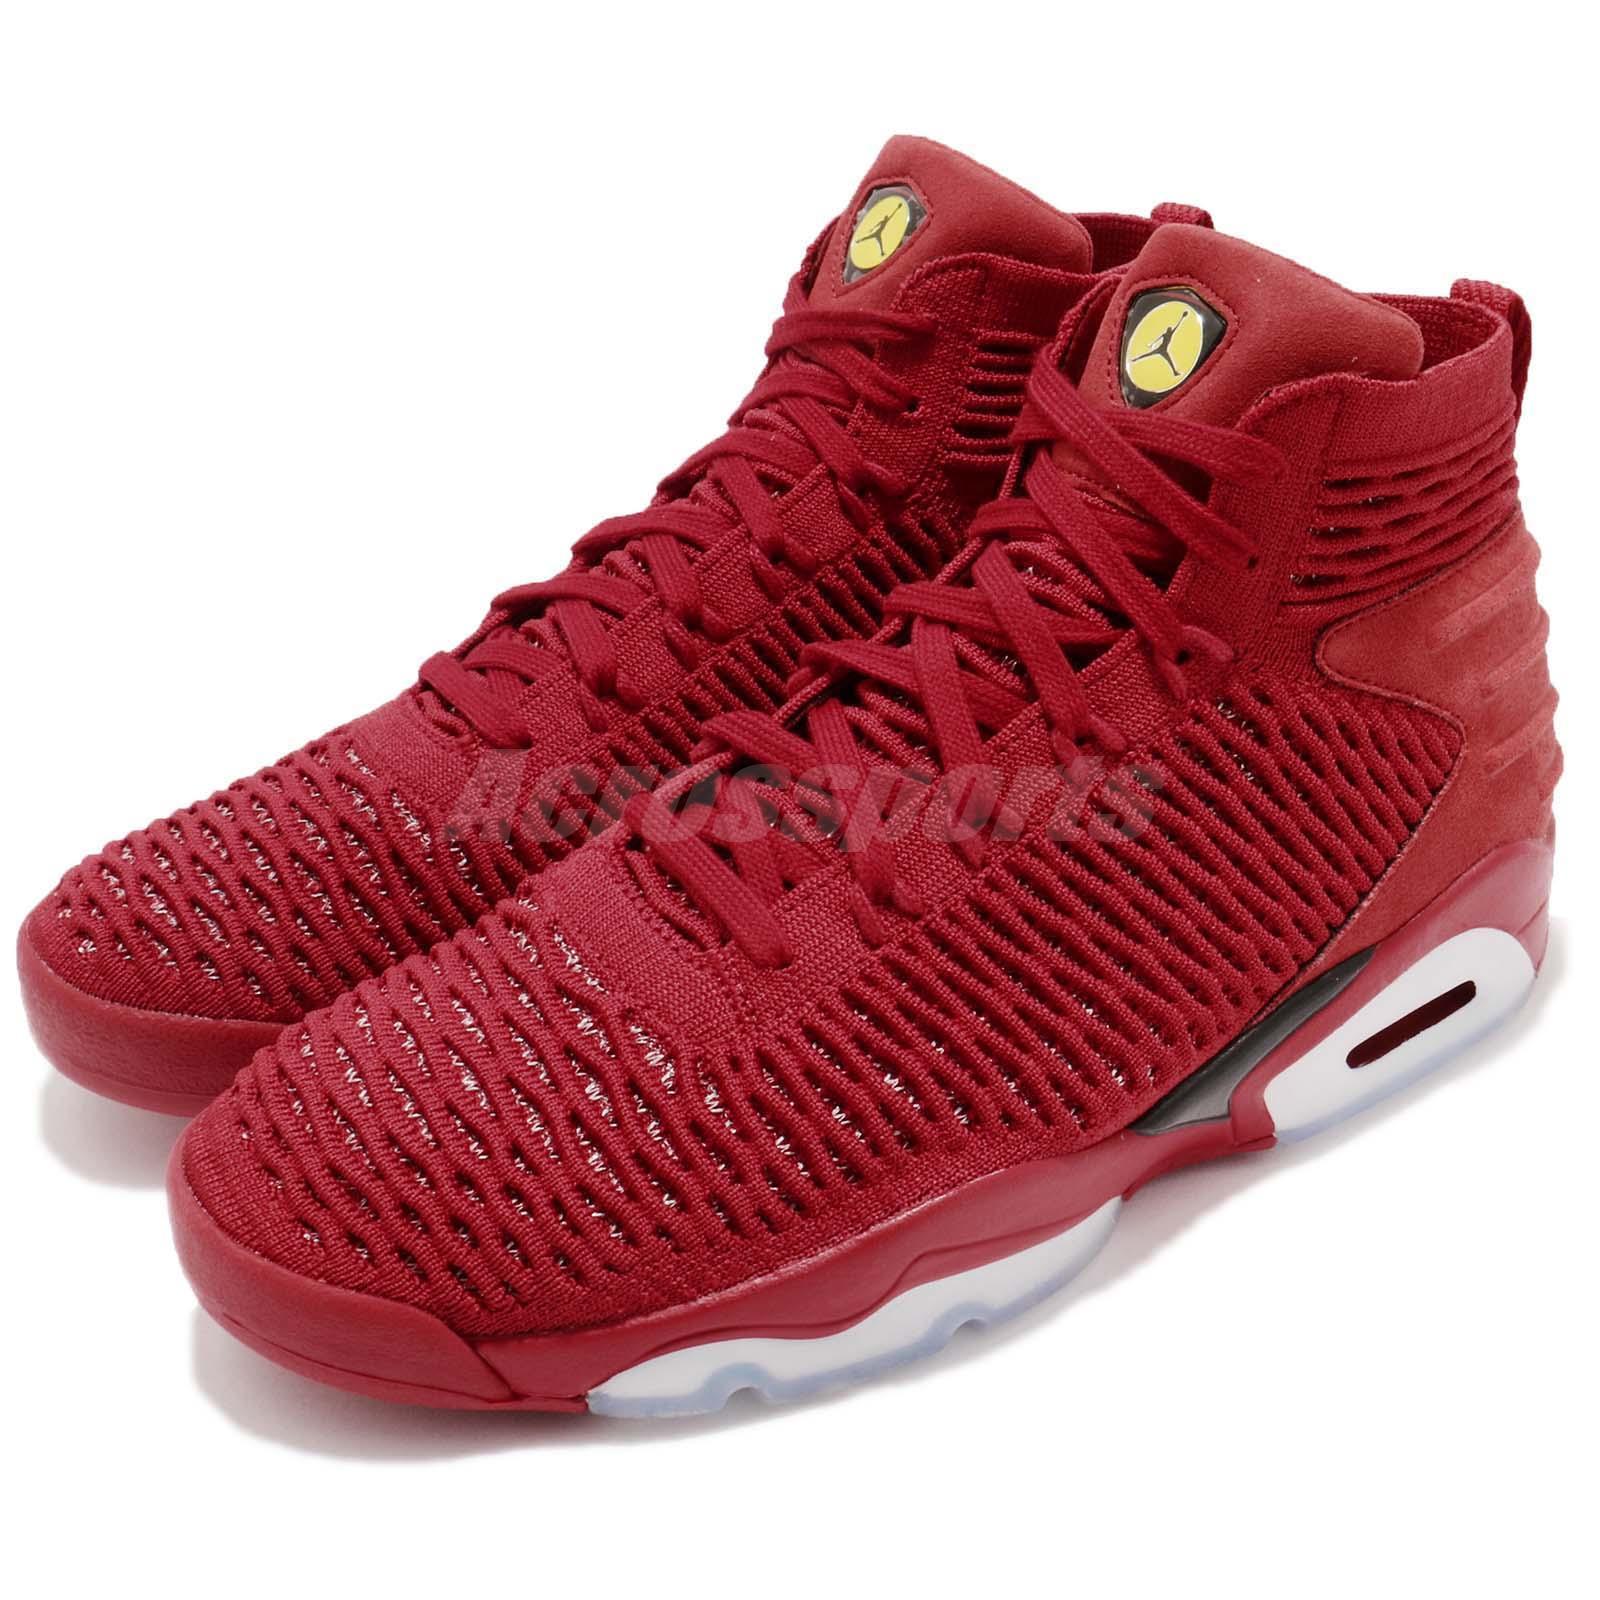 10e1332dcbc Details about Nike Jordan Flyknit Elevation 23 XXIII Last Shot Red Black  Men Shoes AJ8207-601